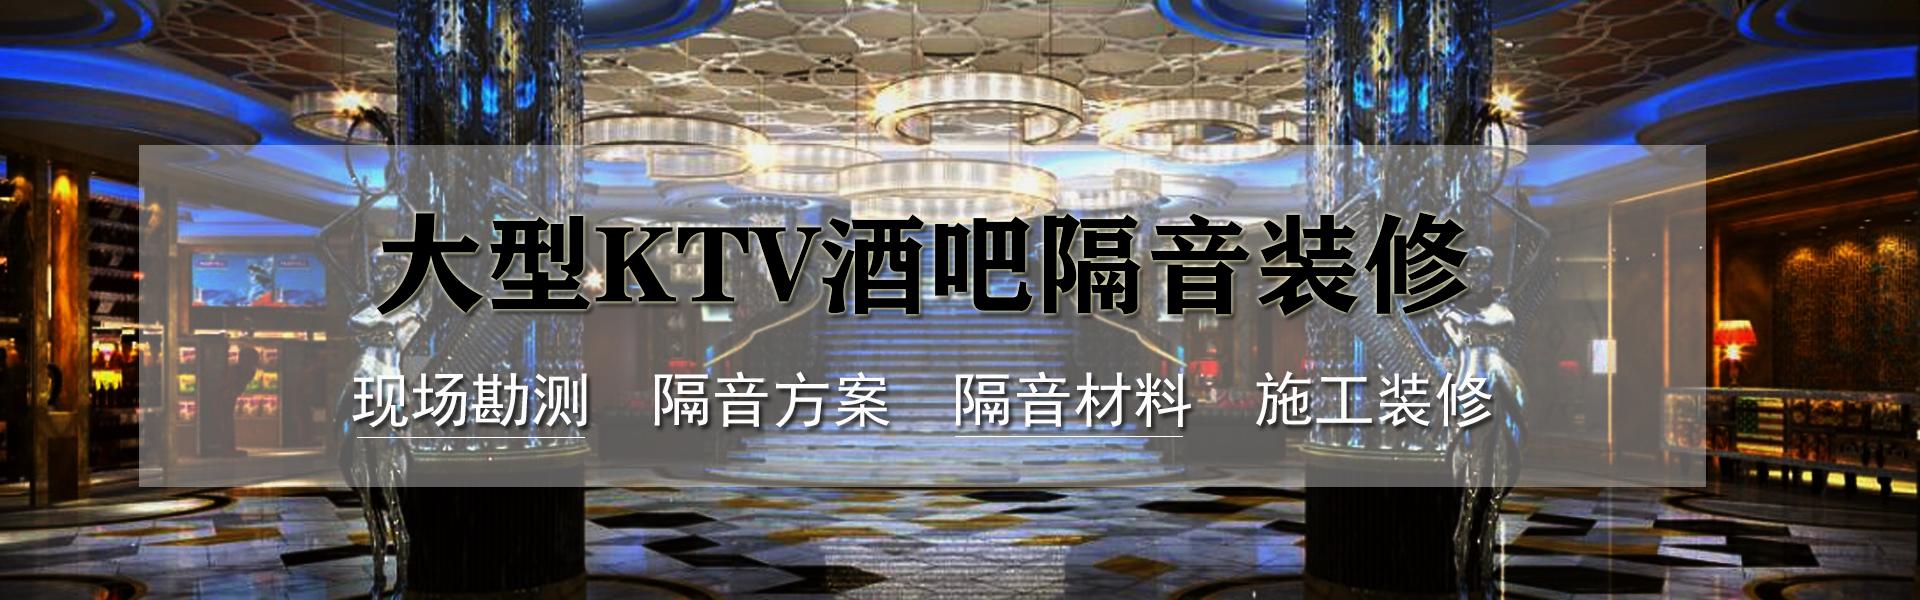 KTV隔音